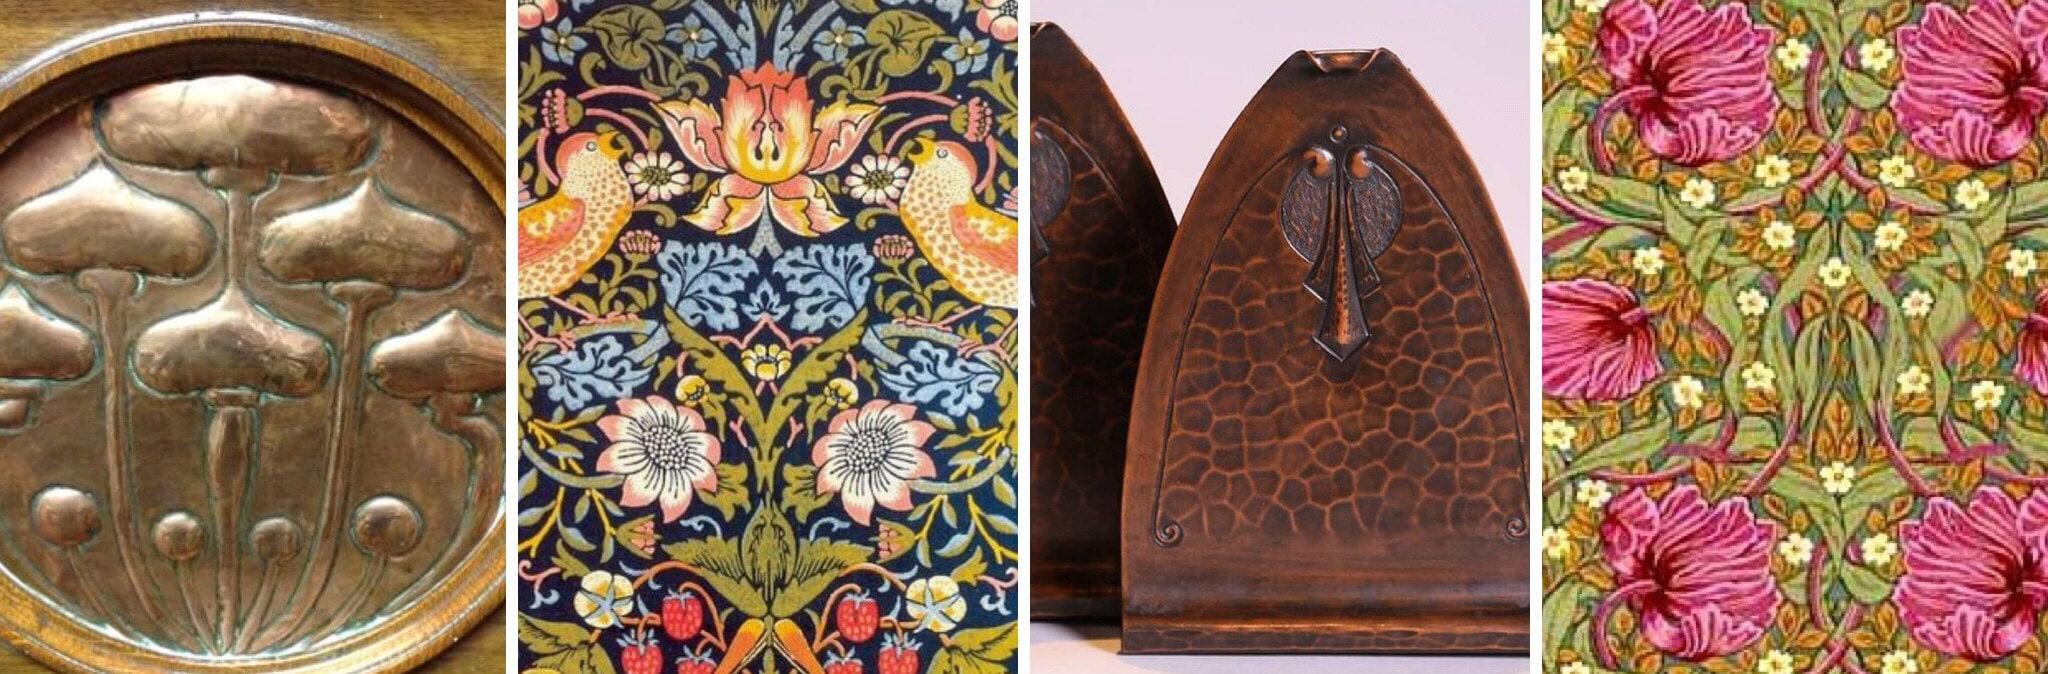 'Arts & Crafts' Design